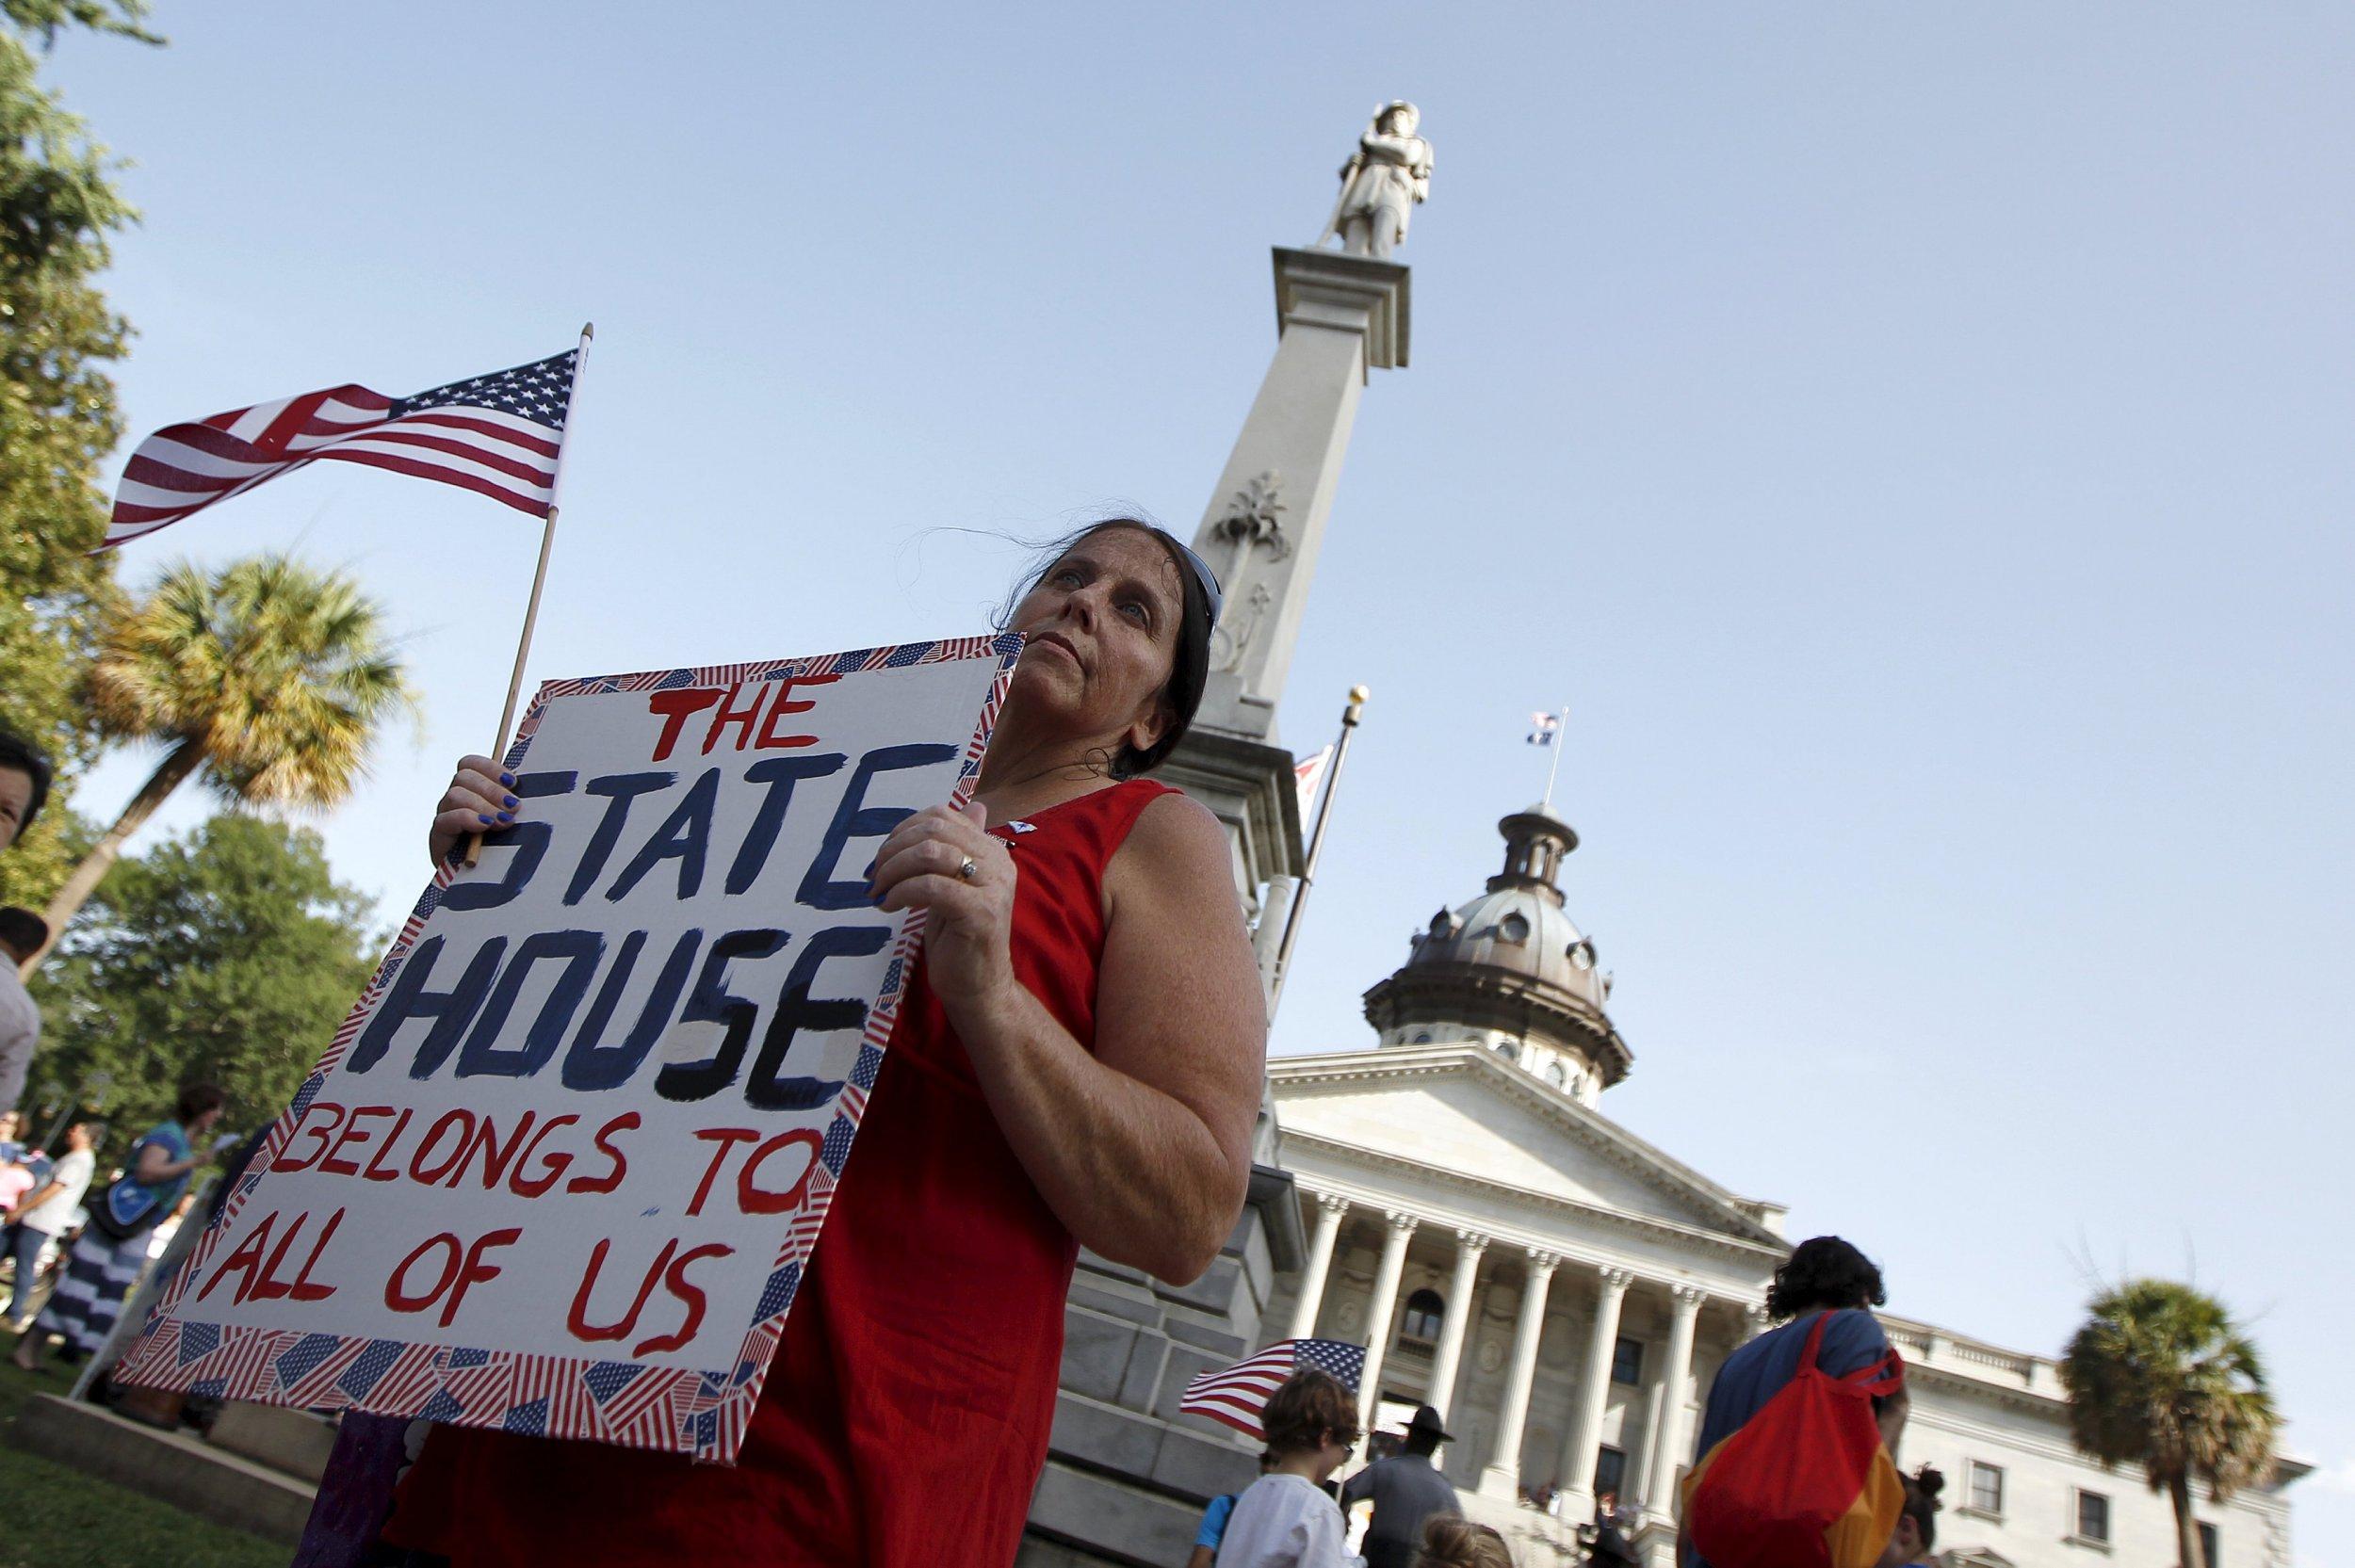 South Carolina Advances Bill to Take Down Confederate Flag